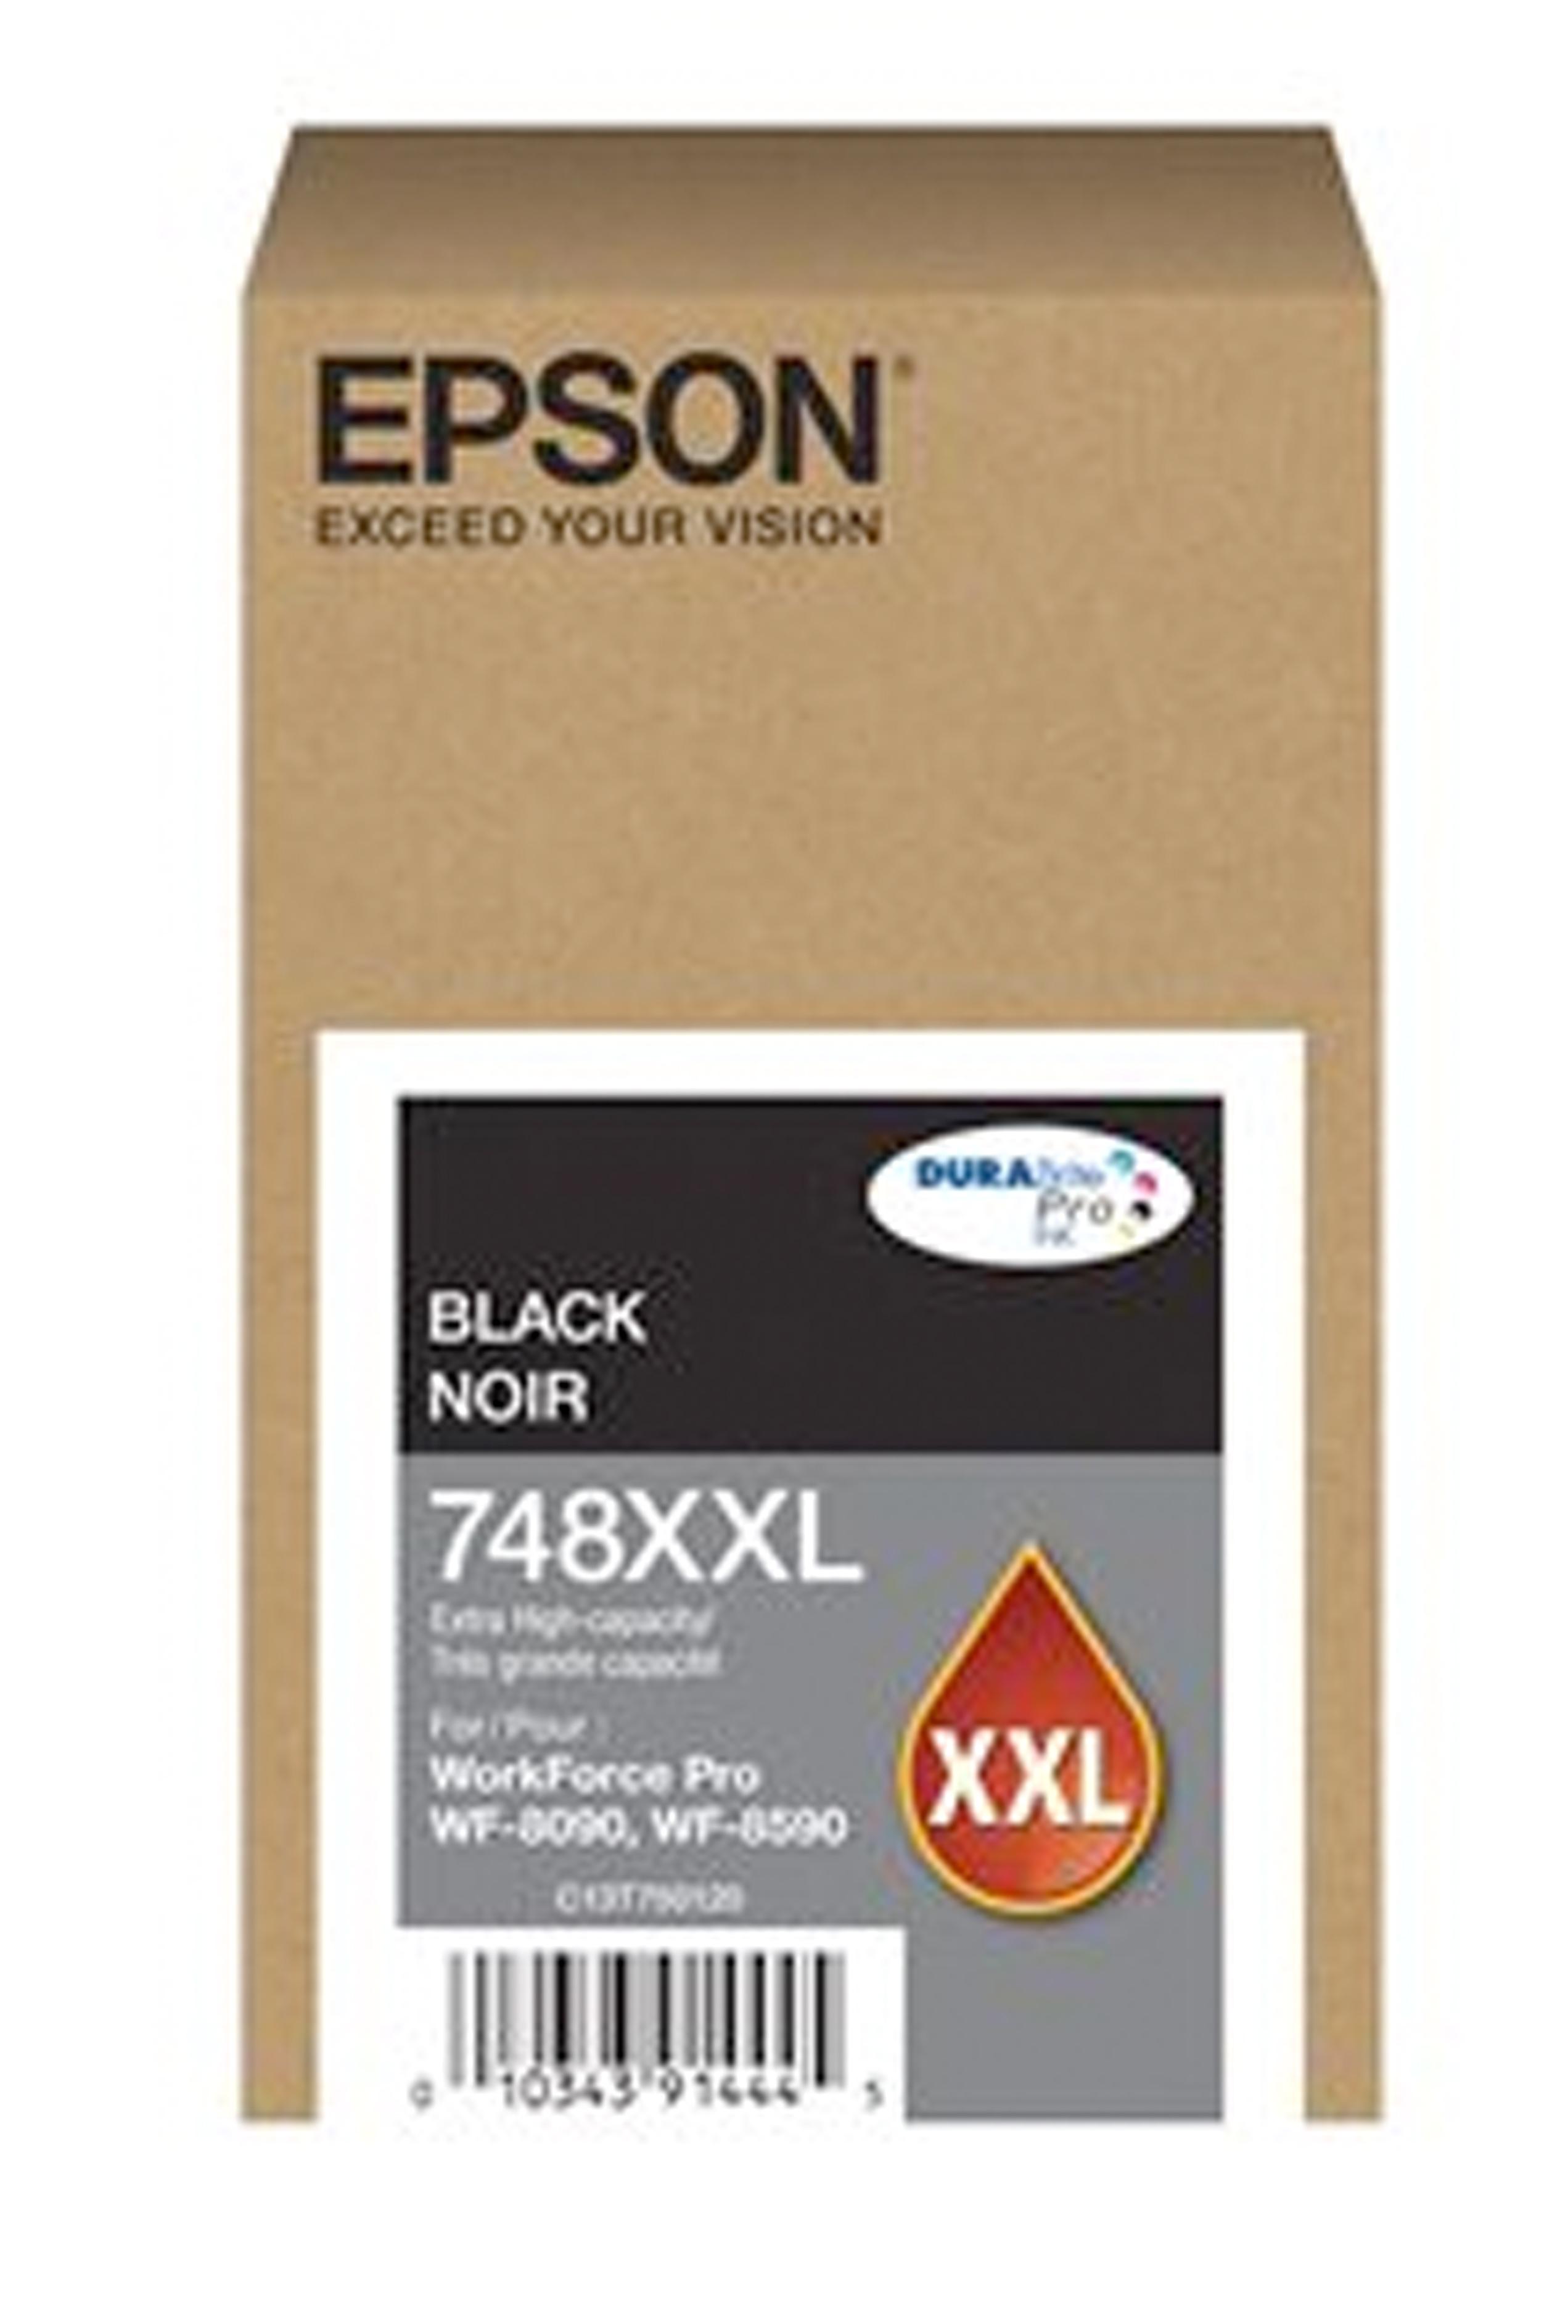 Epson EPSON XH BLACK INK (10000) (T748XXL120)